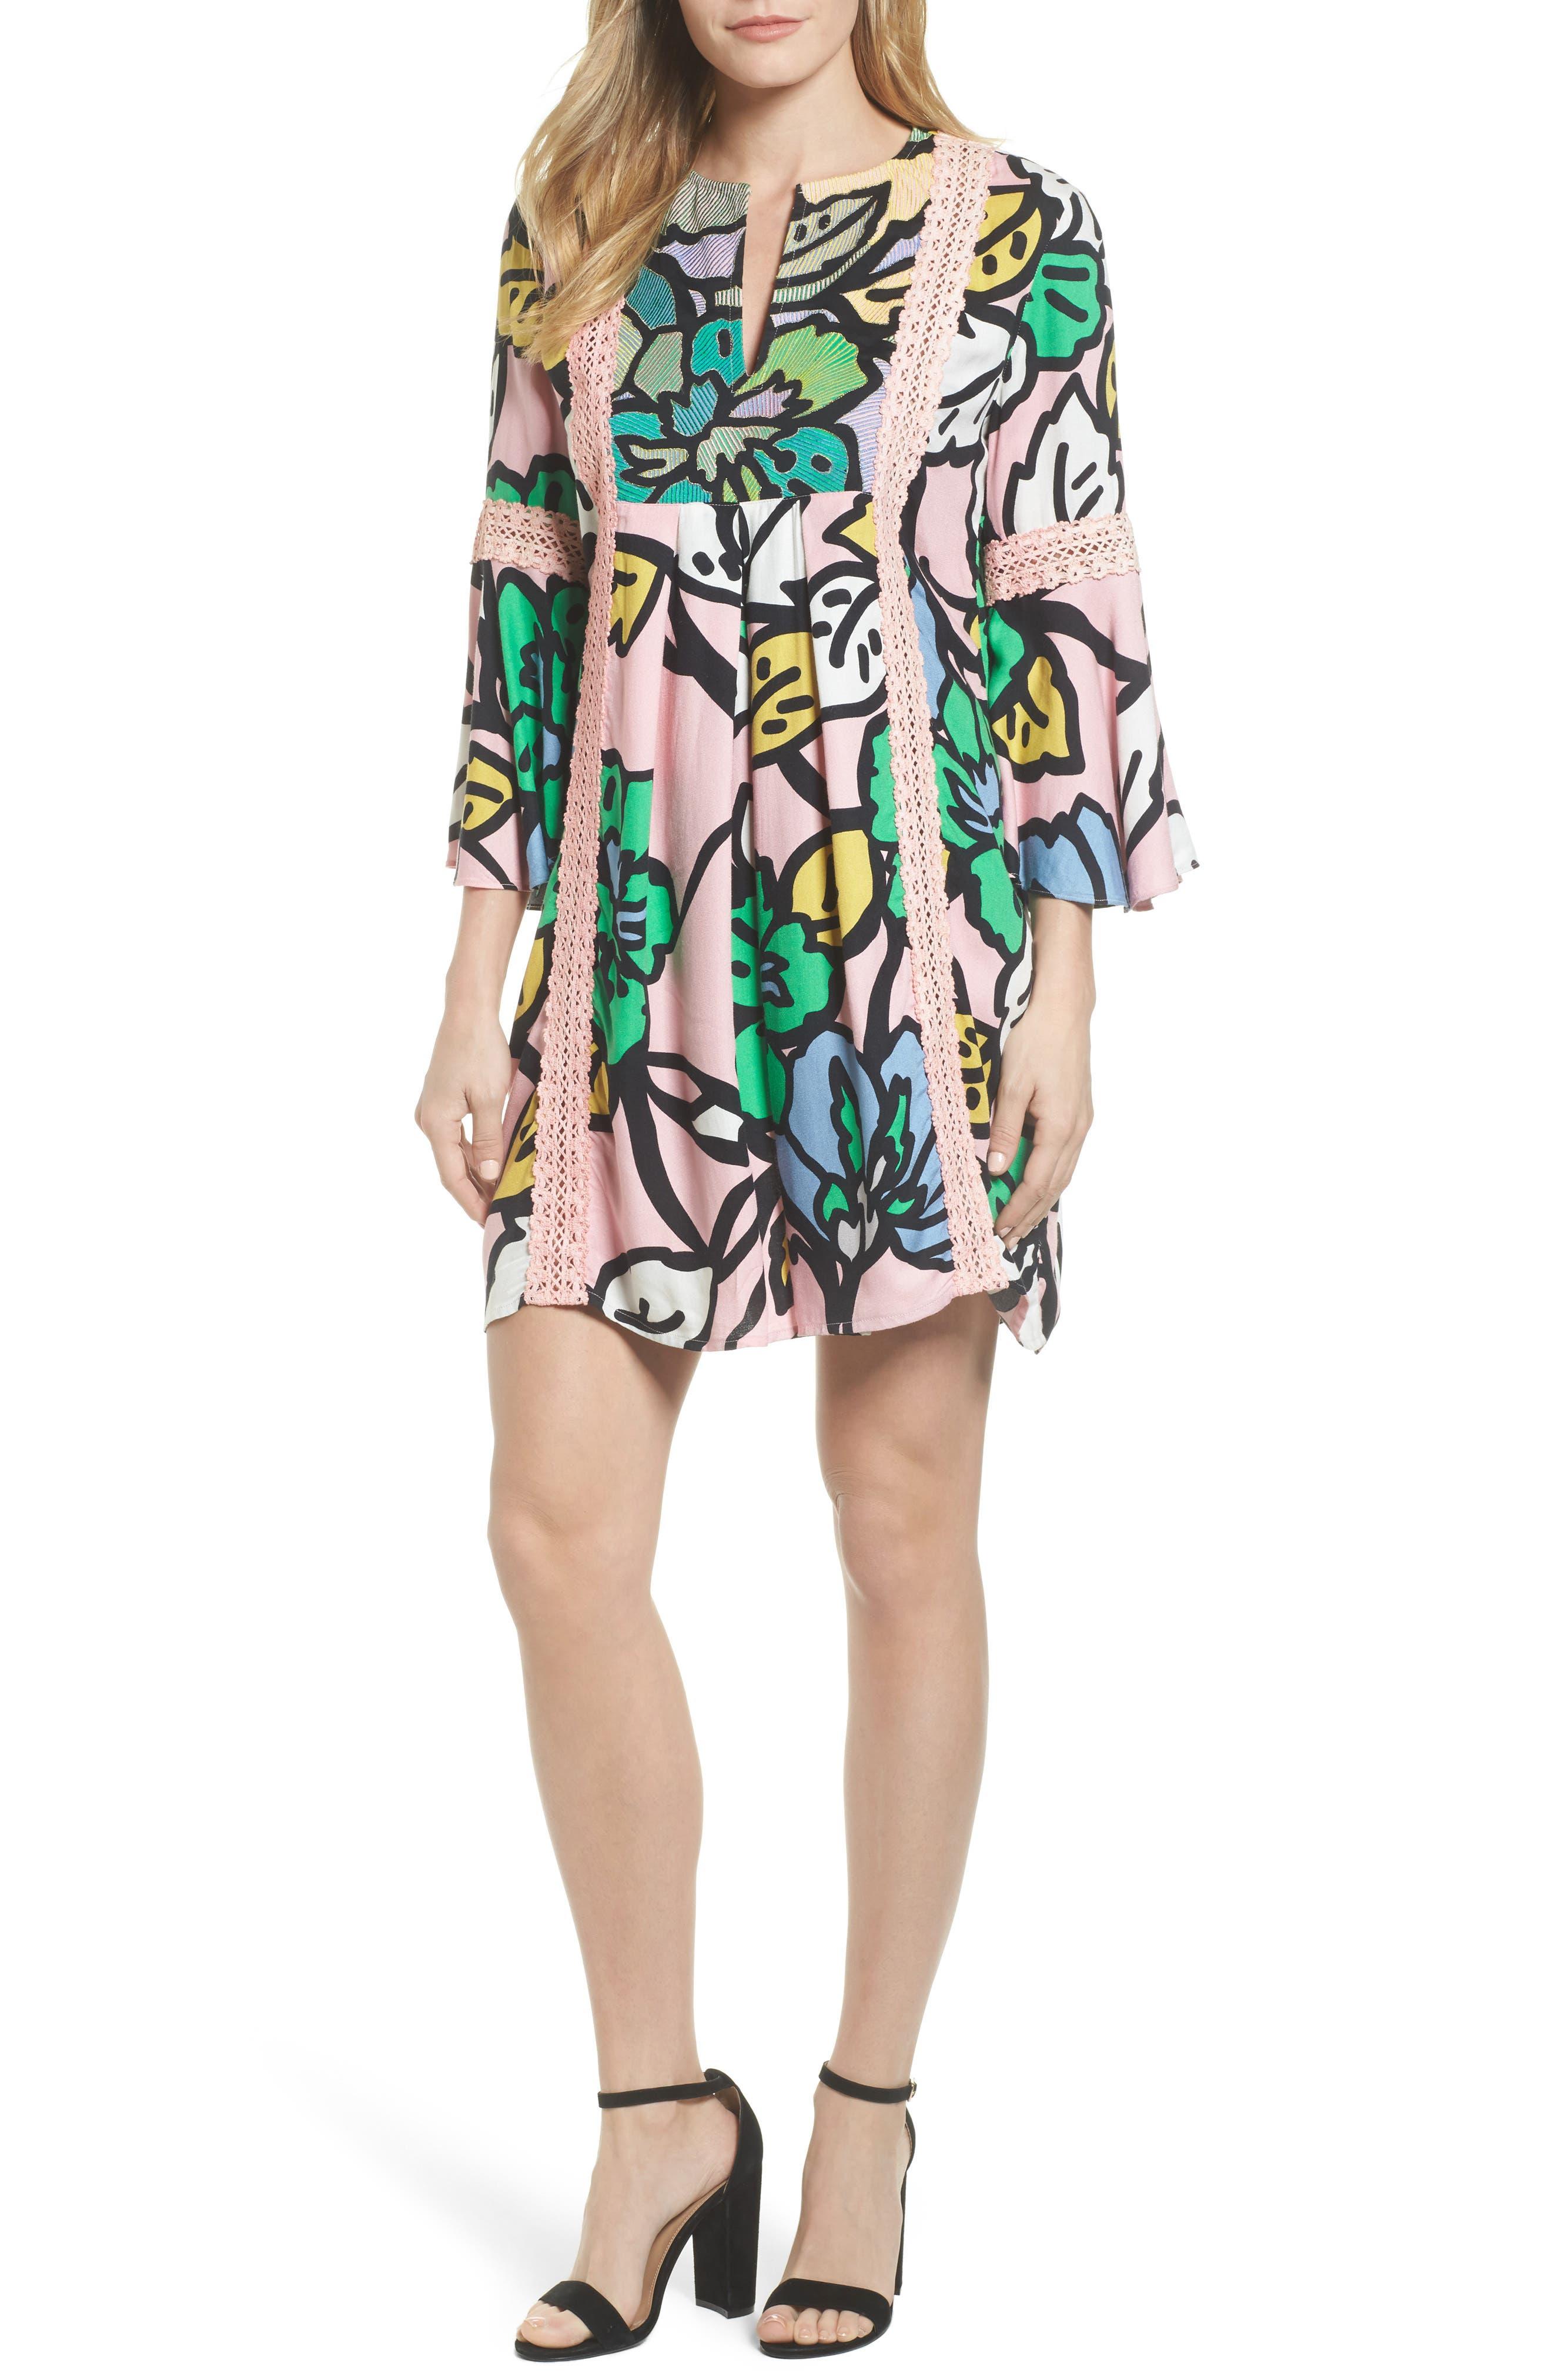 Ancona Mod Print Shift Dress,                         Main,                         color, Mod Pink Print